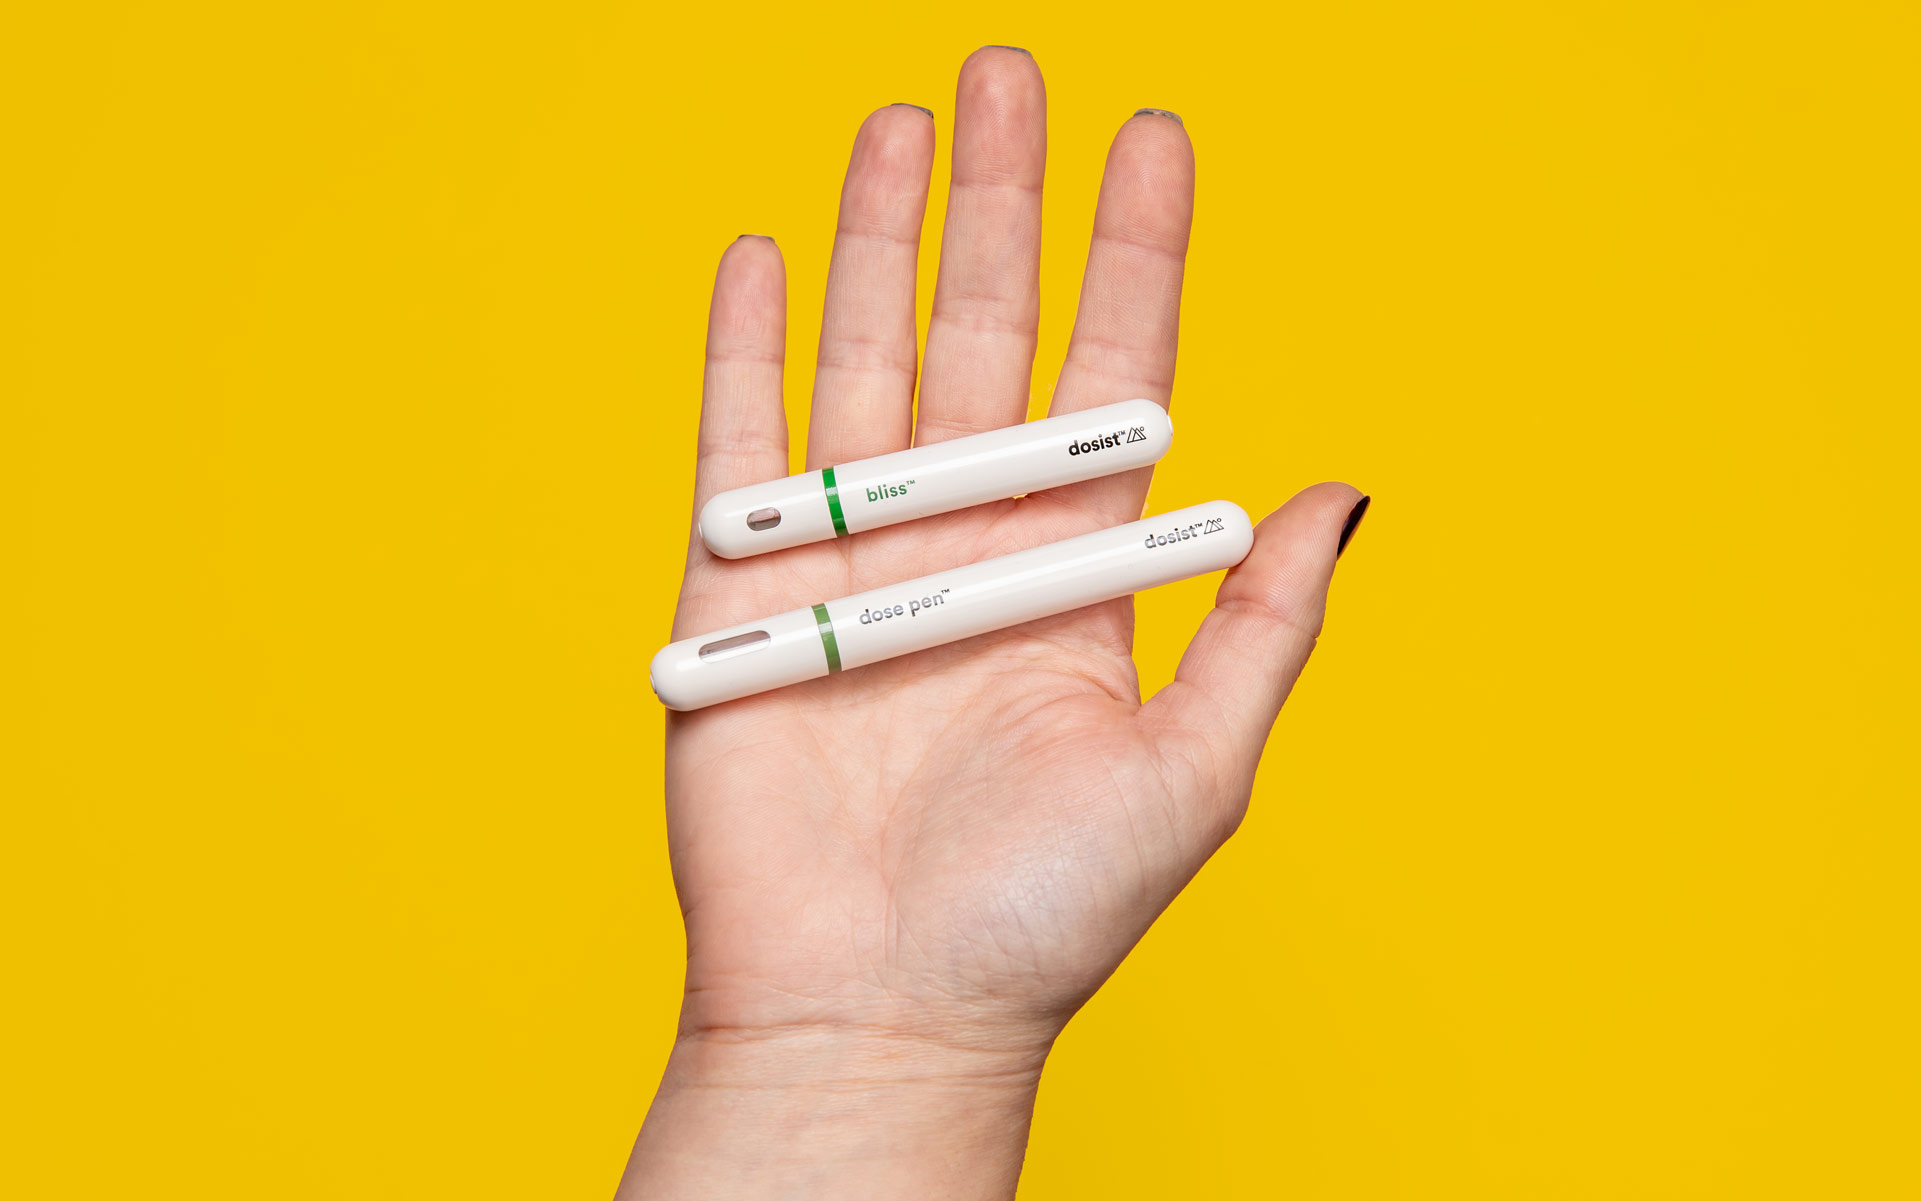 dosist vaporizer pen